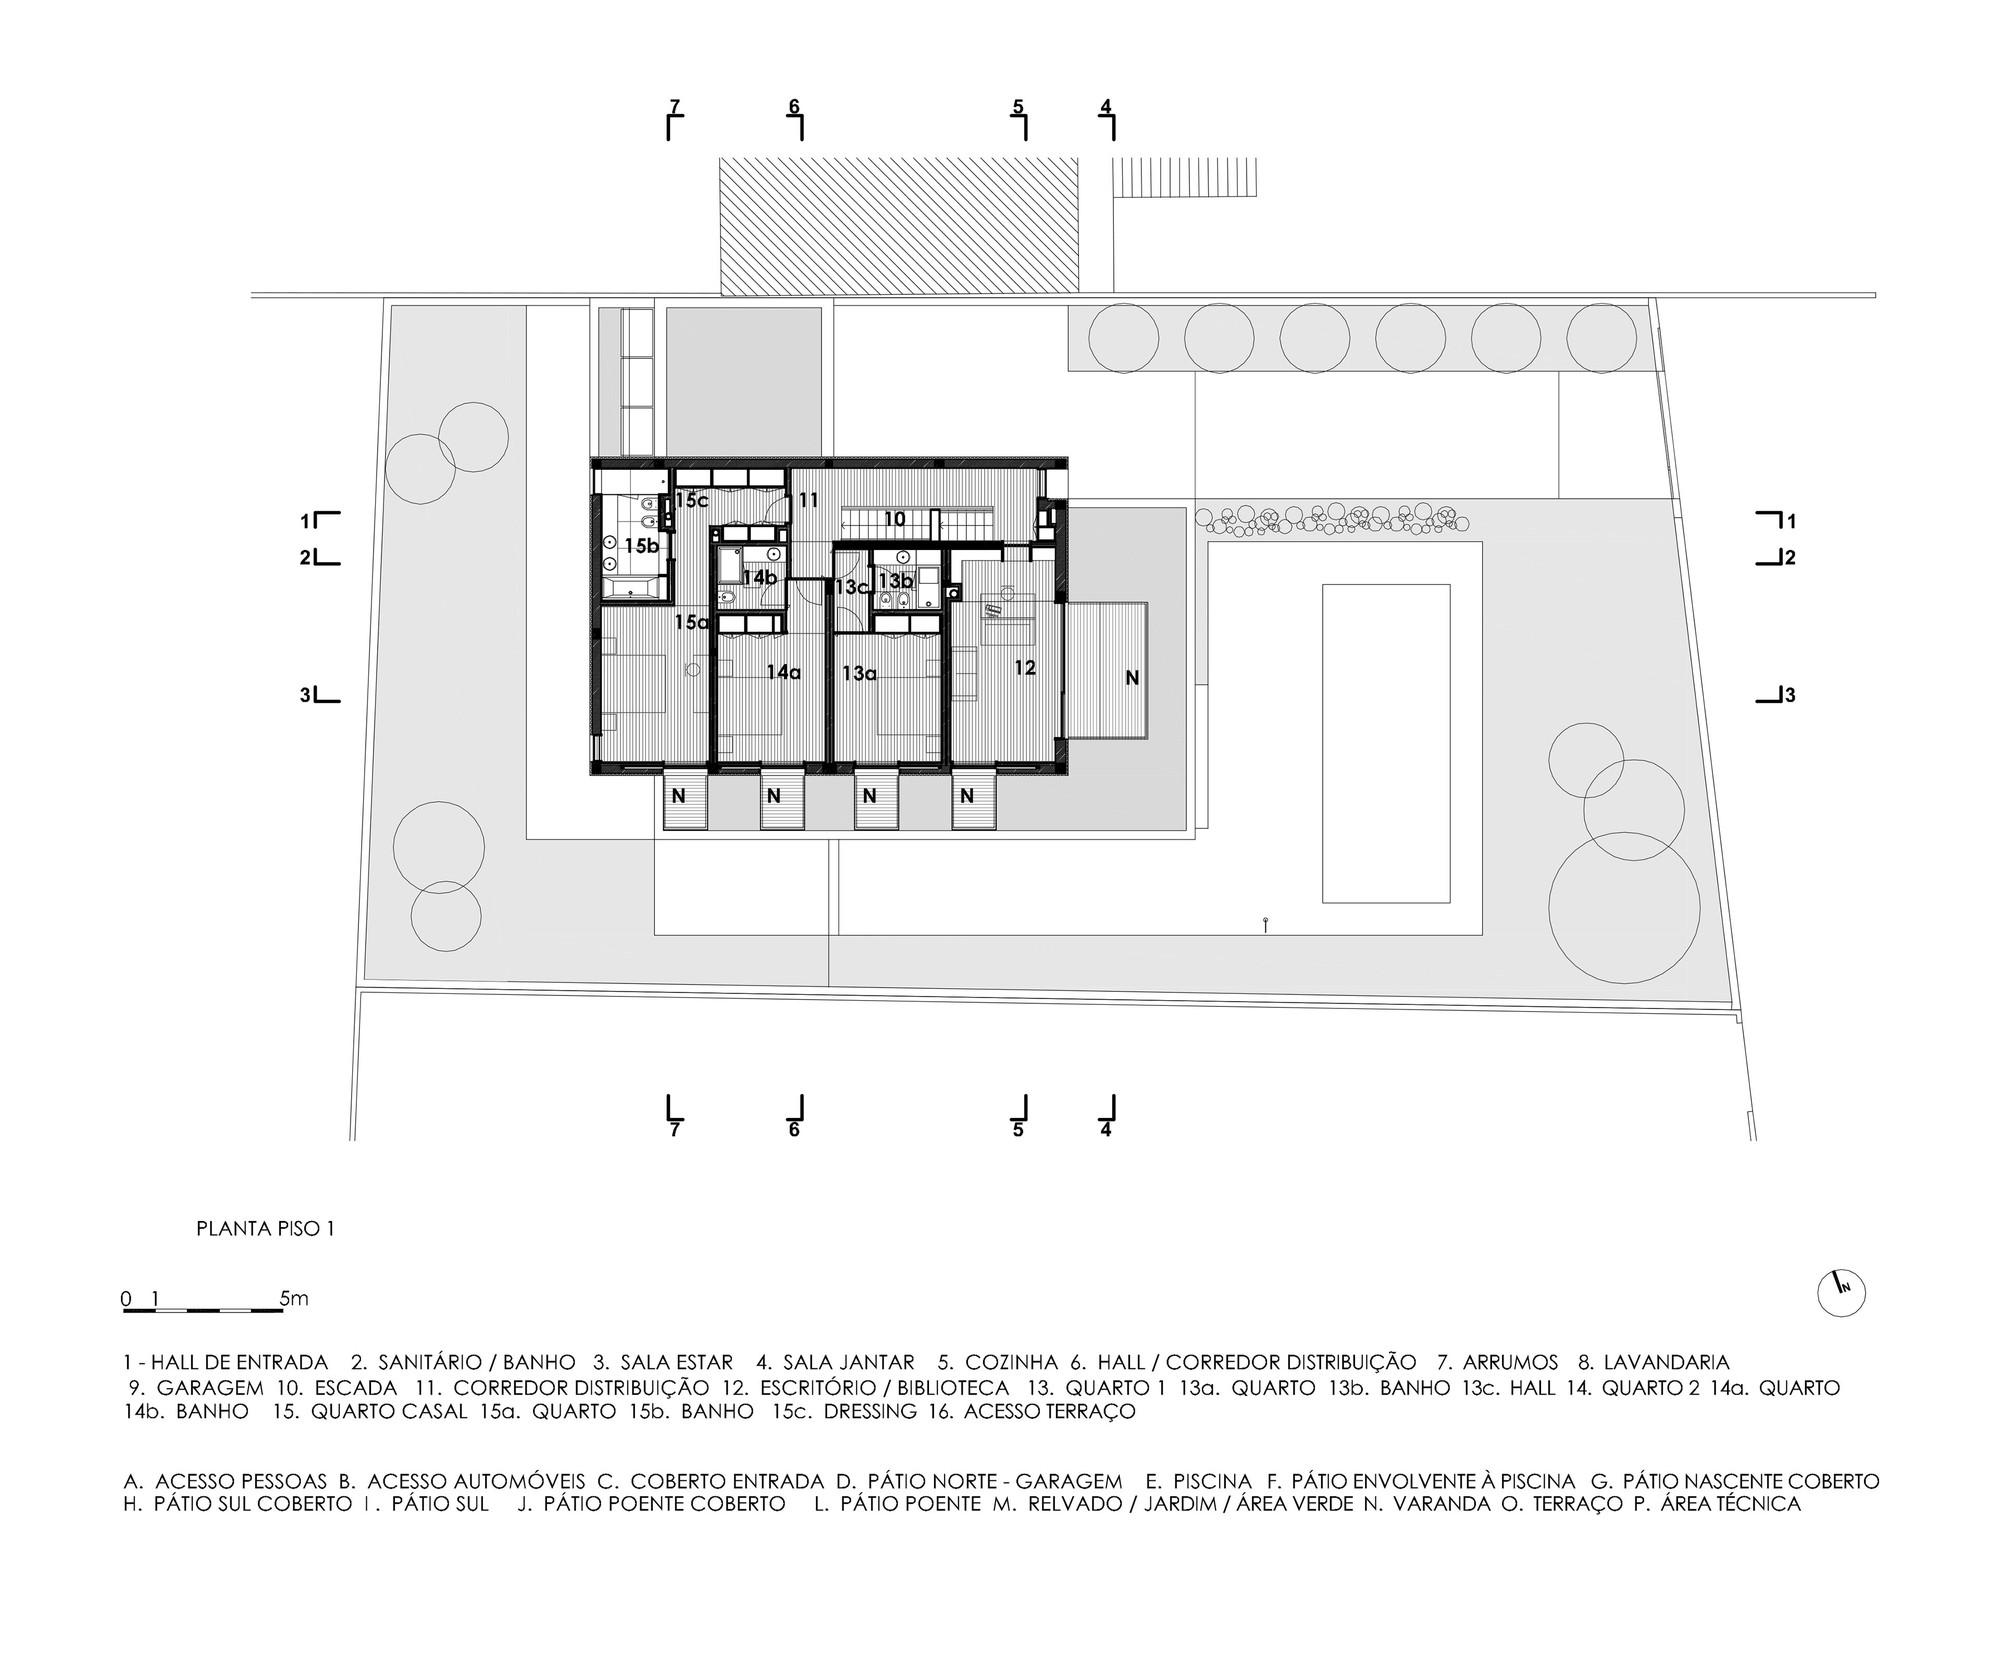 Galer a de casava atelier d 39 arquitectura j a lopes da - Atelier arquitectura ...